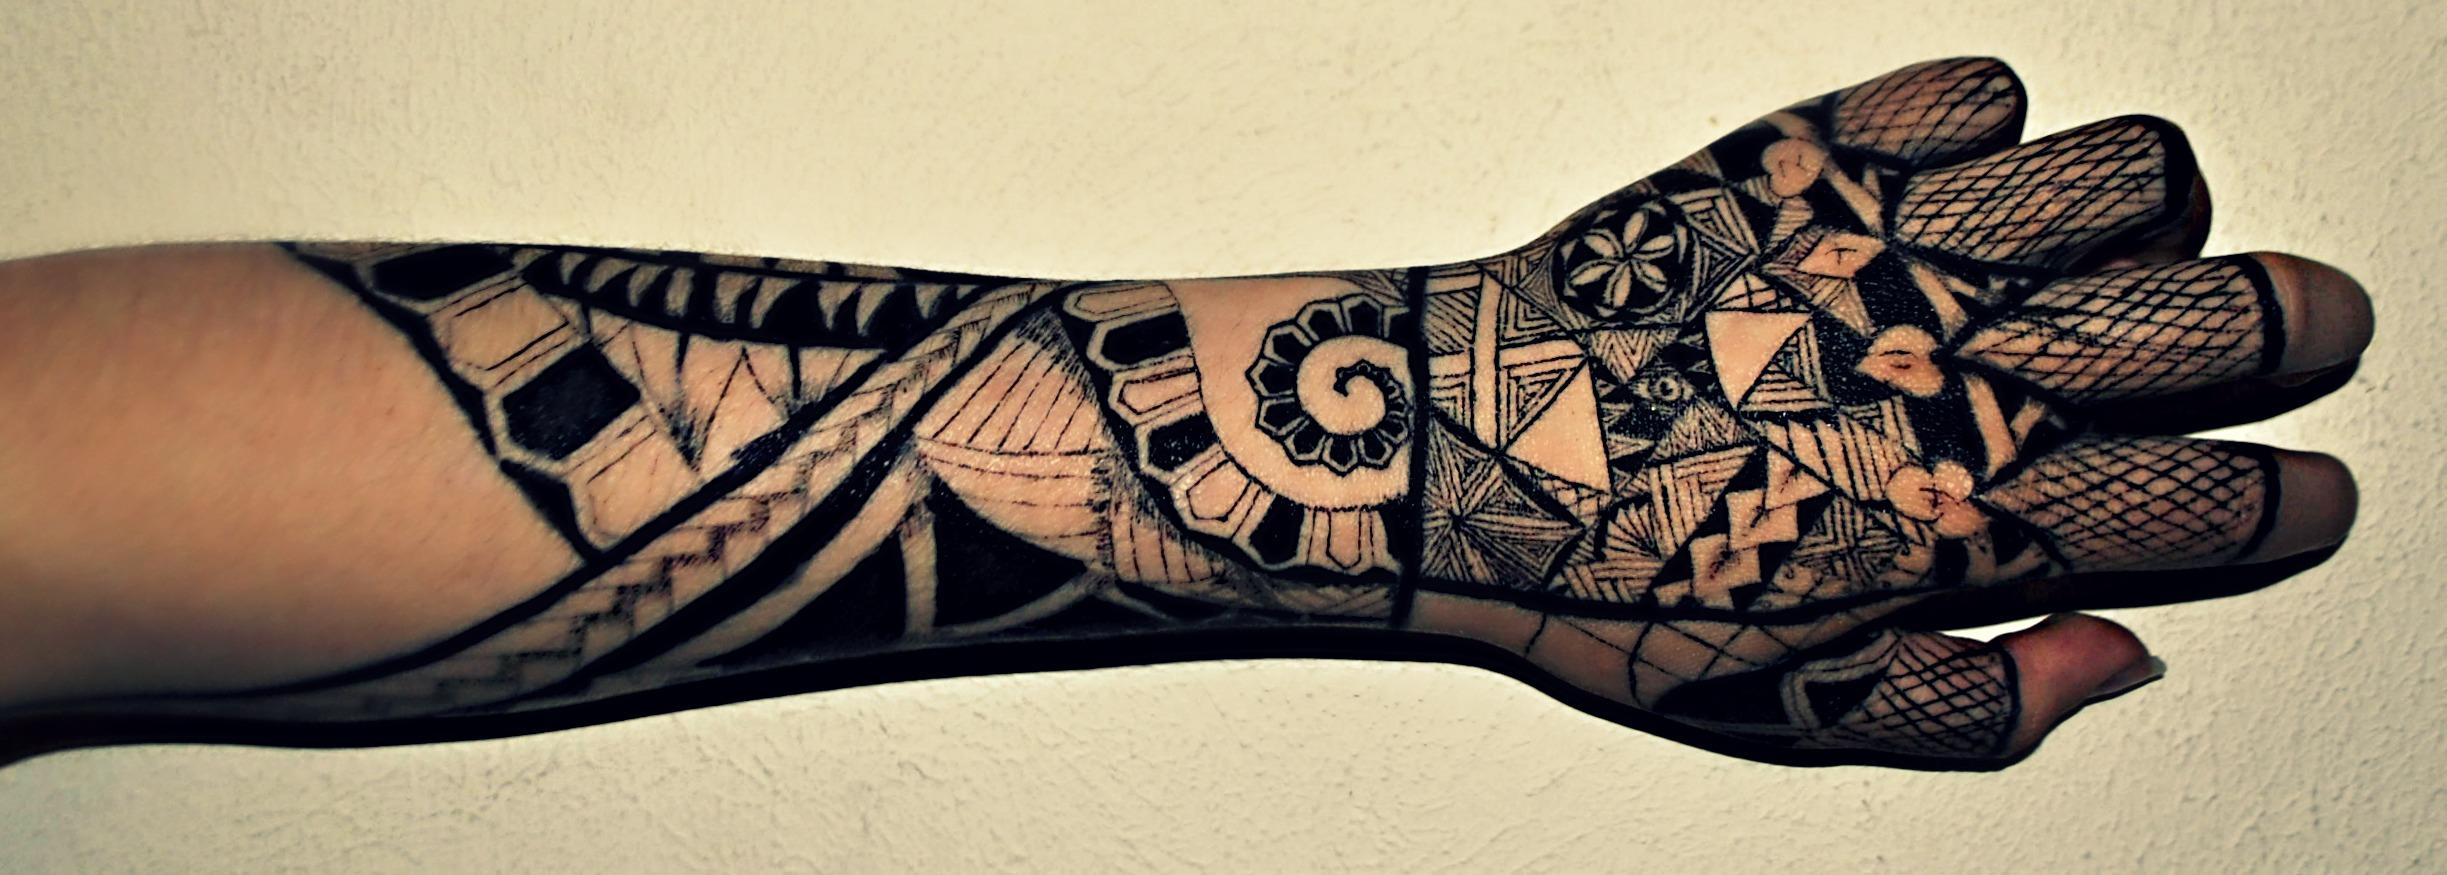 Henna Arm Sleeve Tattoo Polynesian half sleeve byHenna Tattoo Arm Sleeve